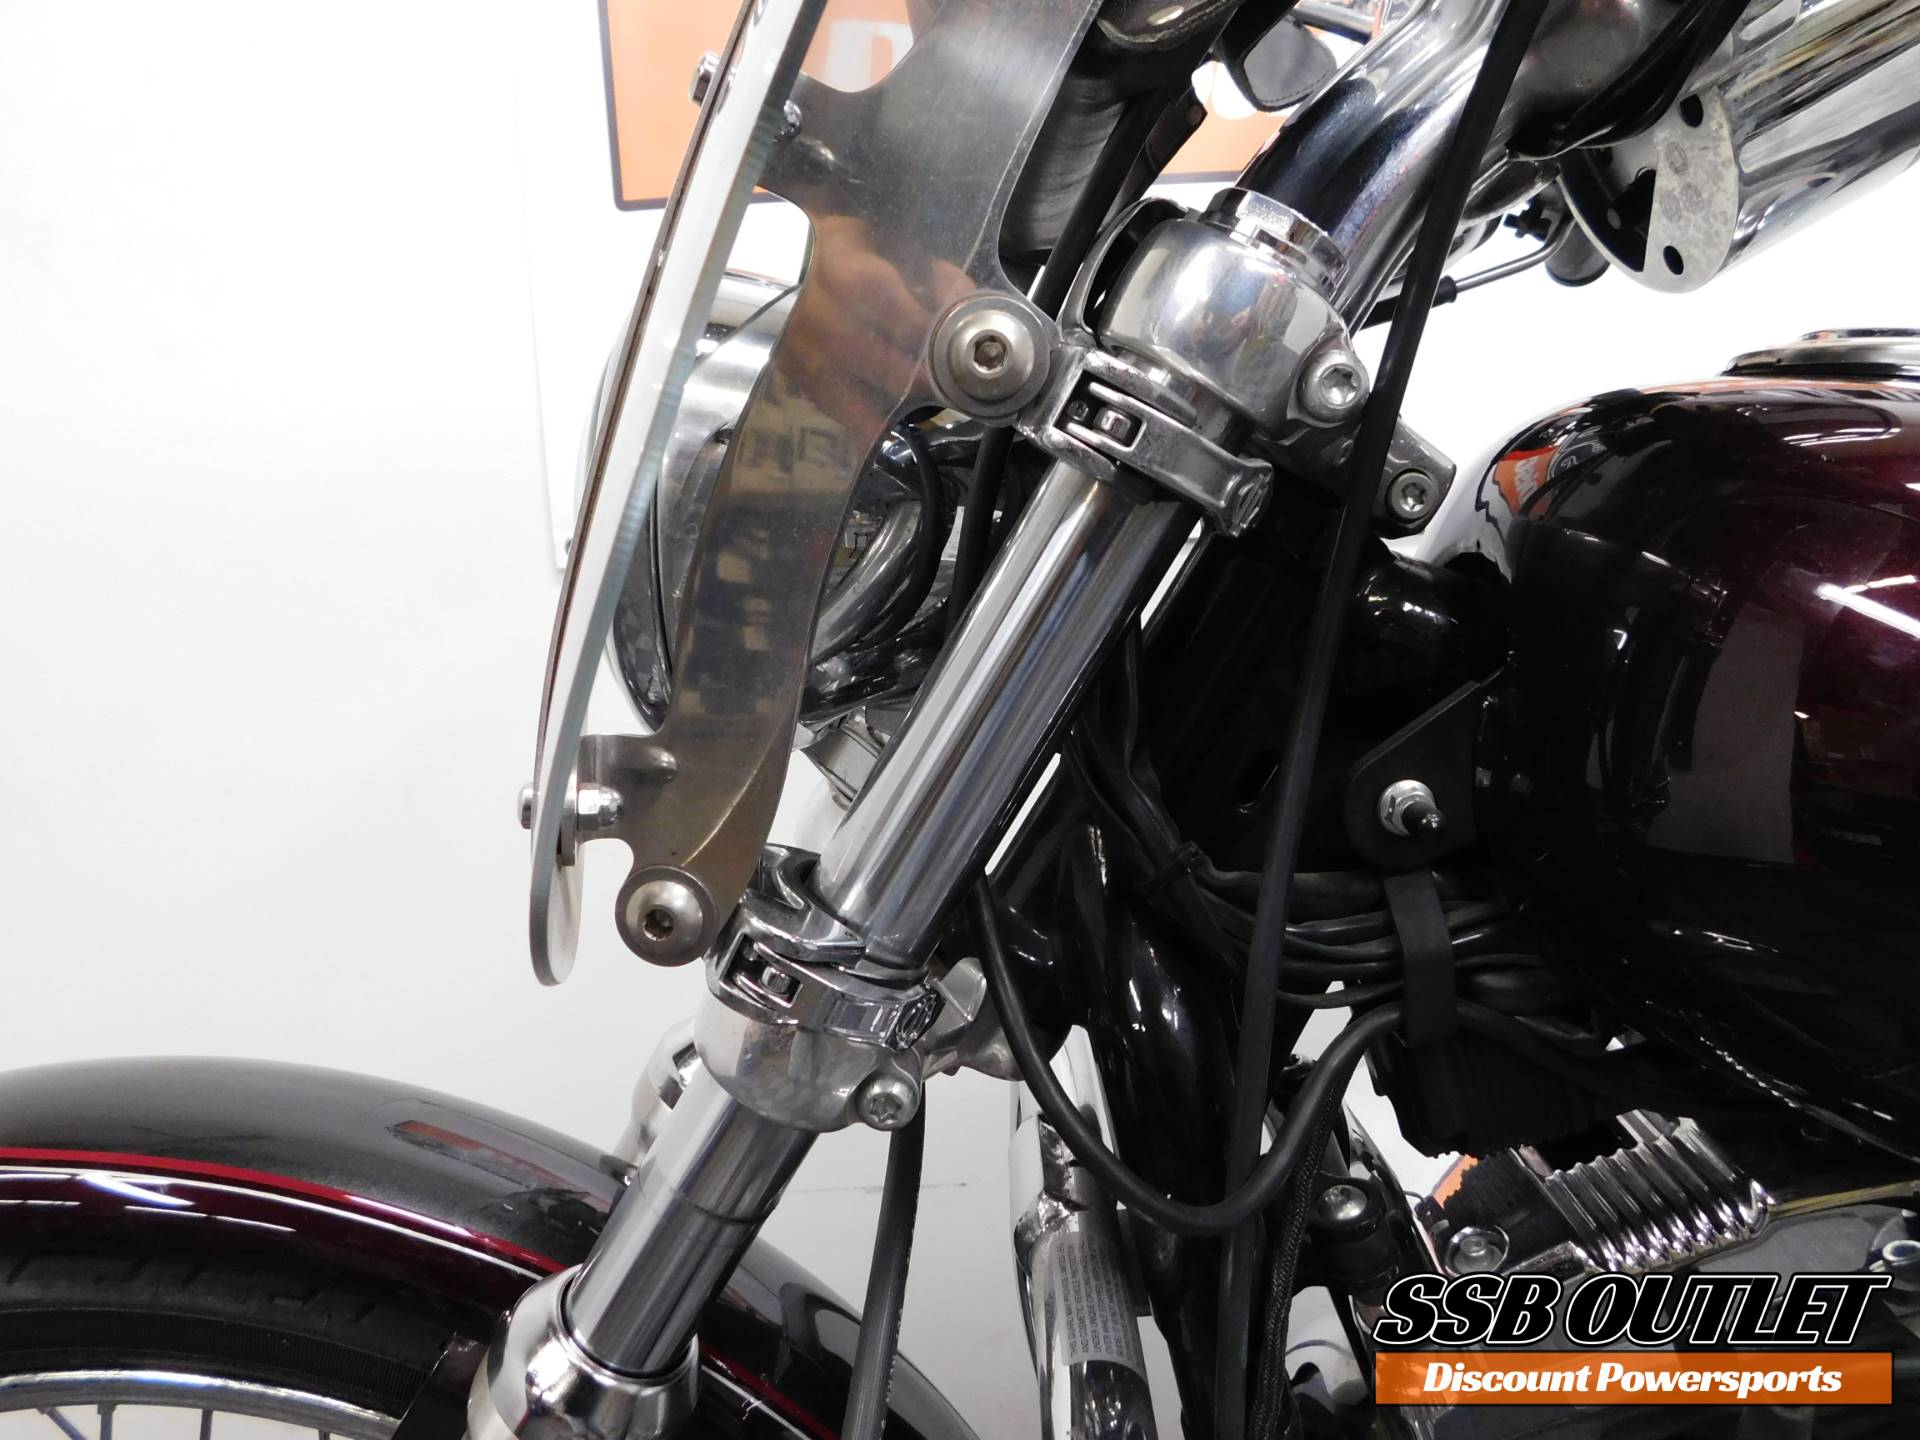 2006 Harley-Davidson Sportster 1200 Custom 12